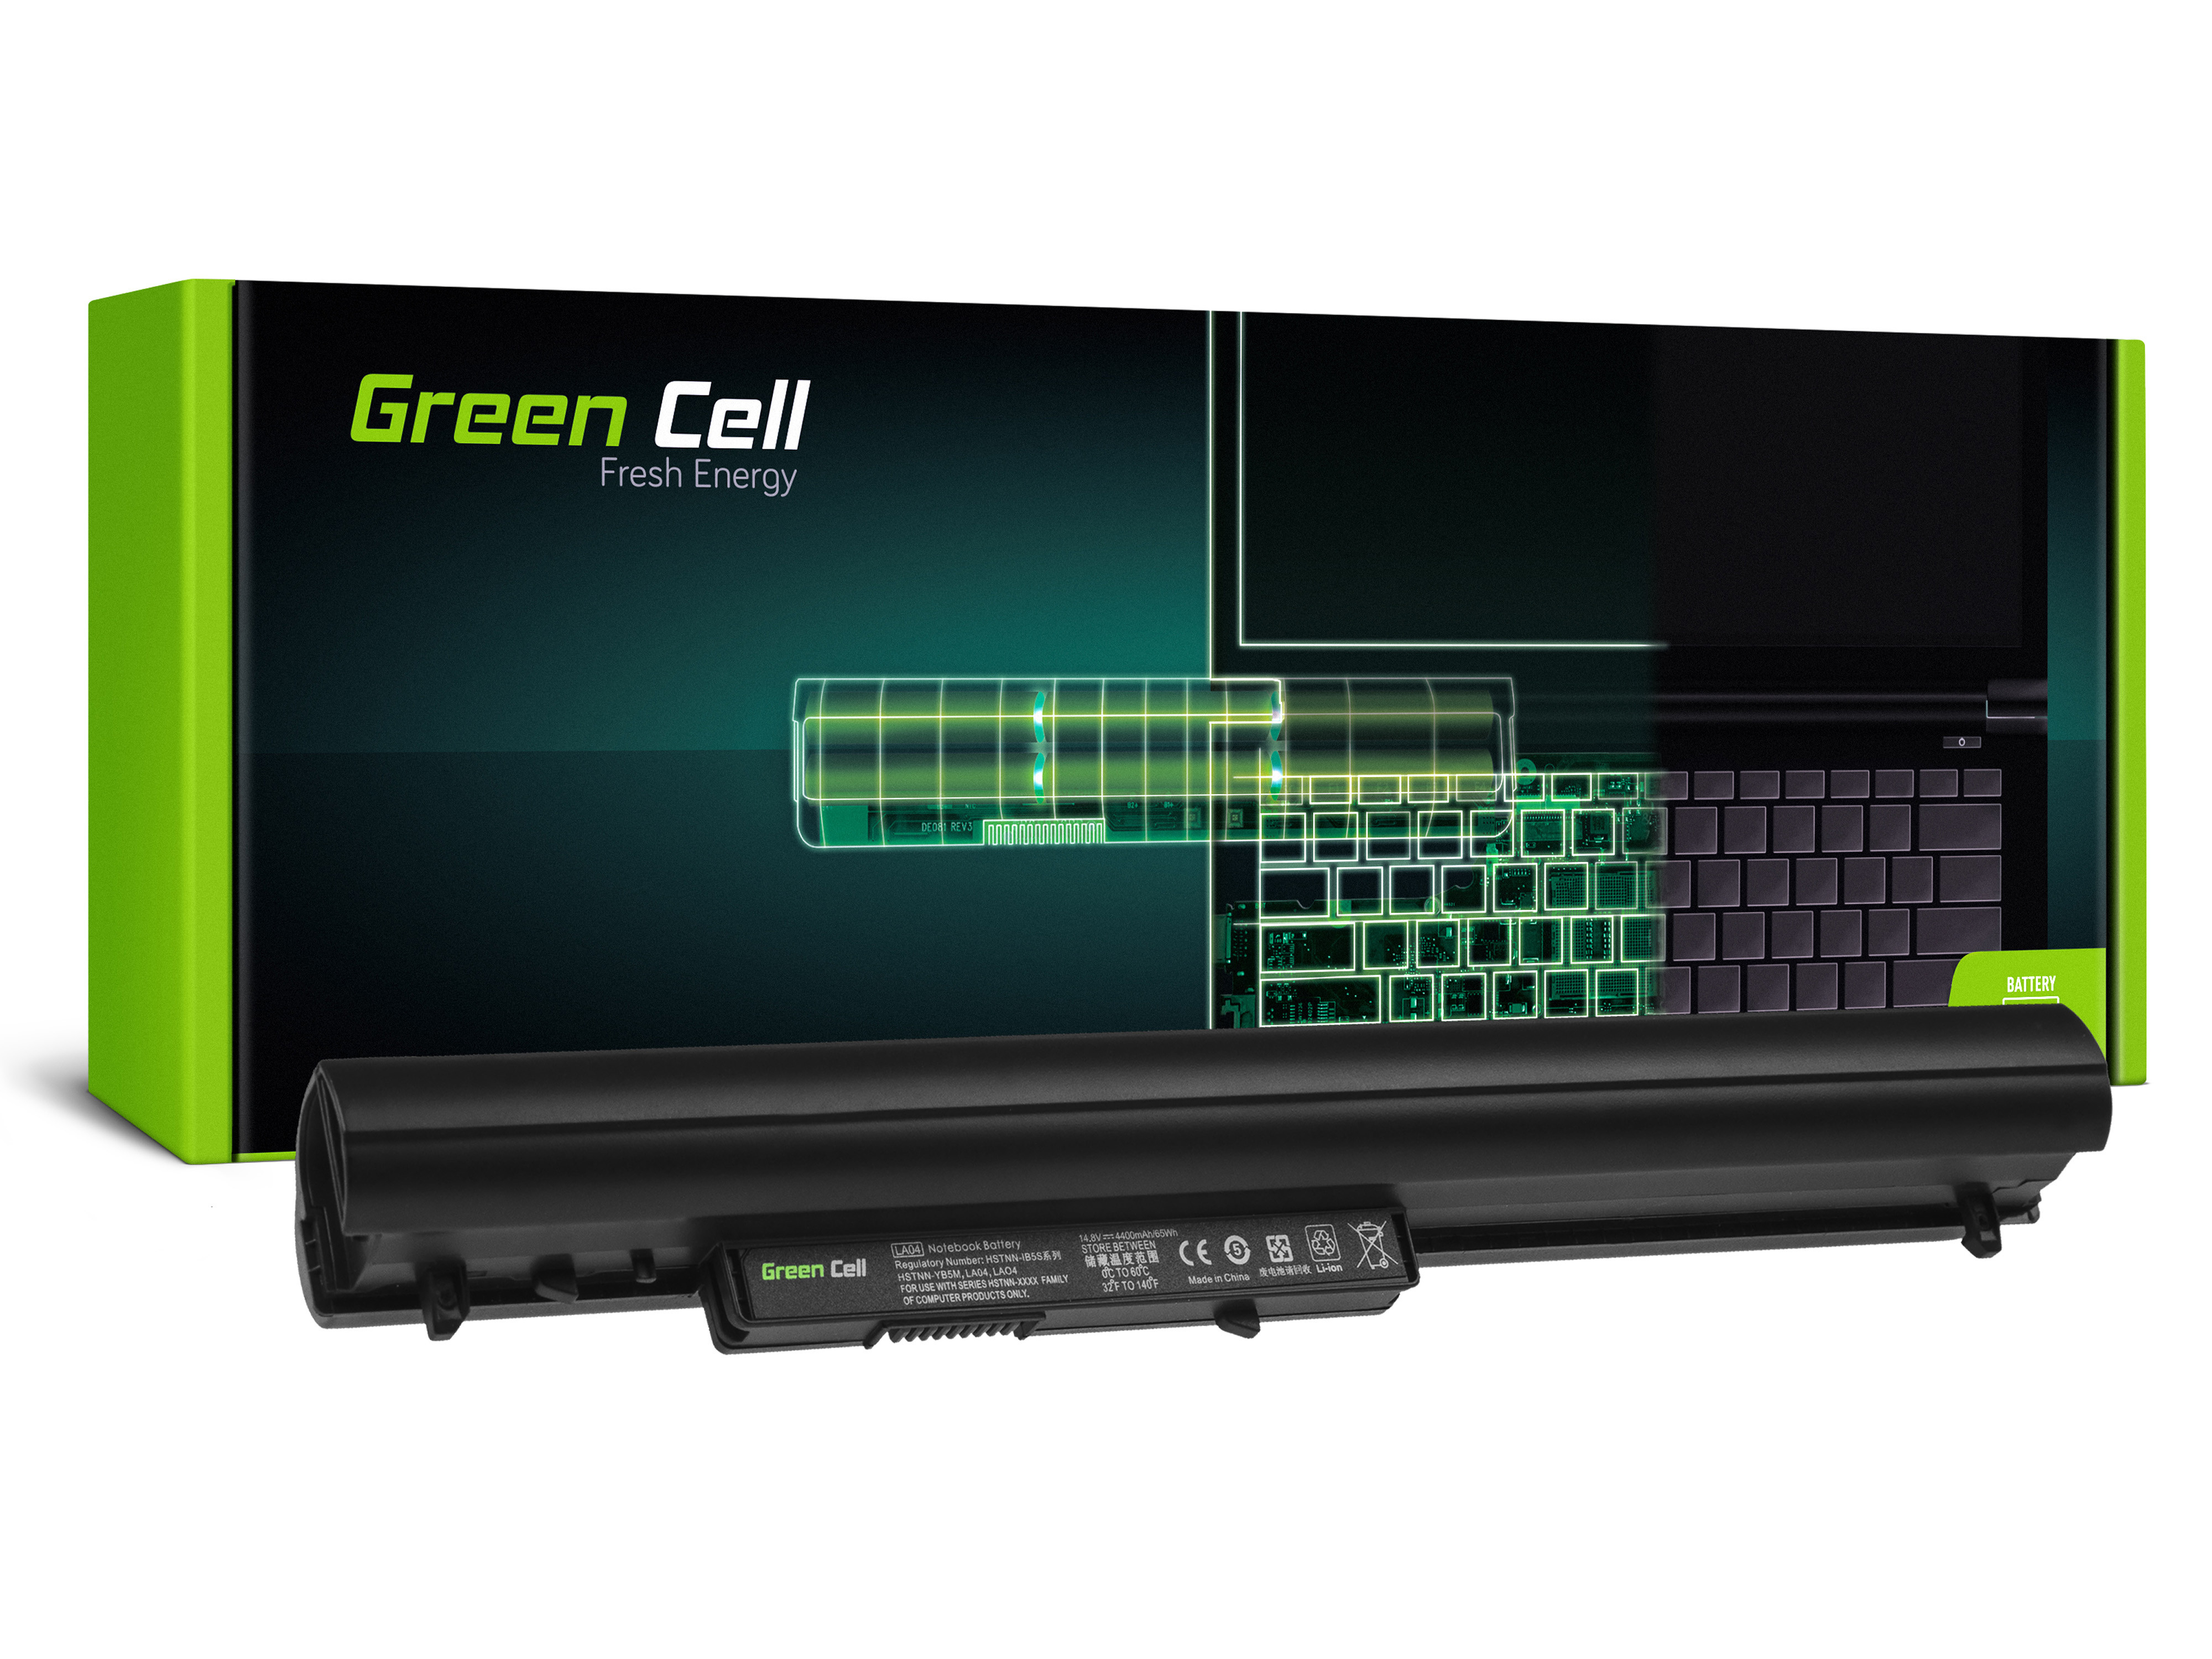 Green Cell Baterie Extended LA04 LA04DF pro HP Pavilion 15-N 15-N025SW 15-N065SW 15-N070SW 15-N080SW 15-N225SW 15-N230